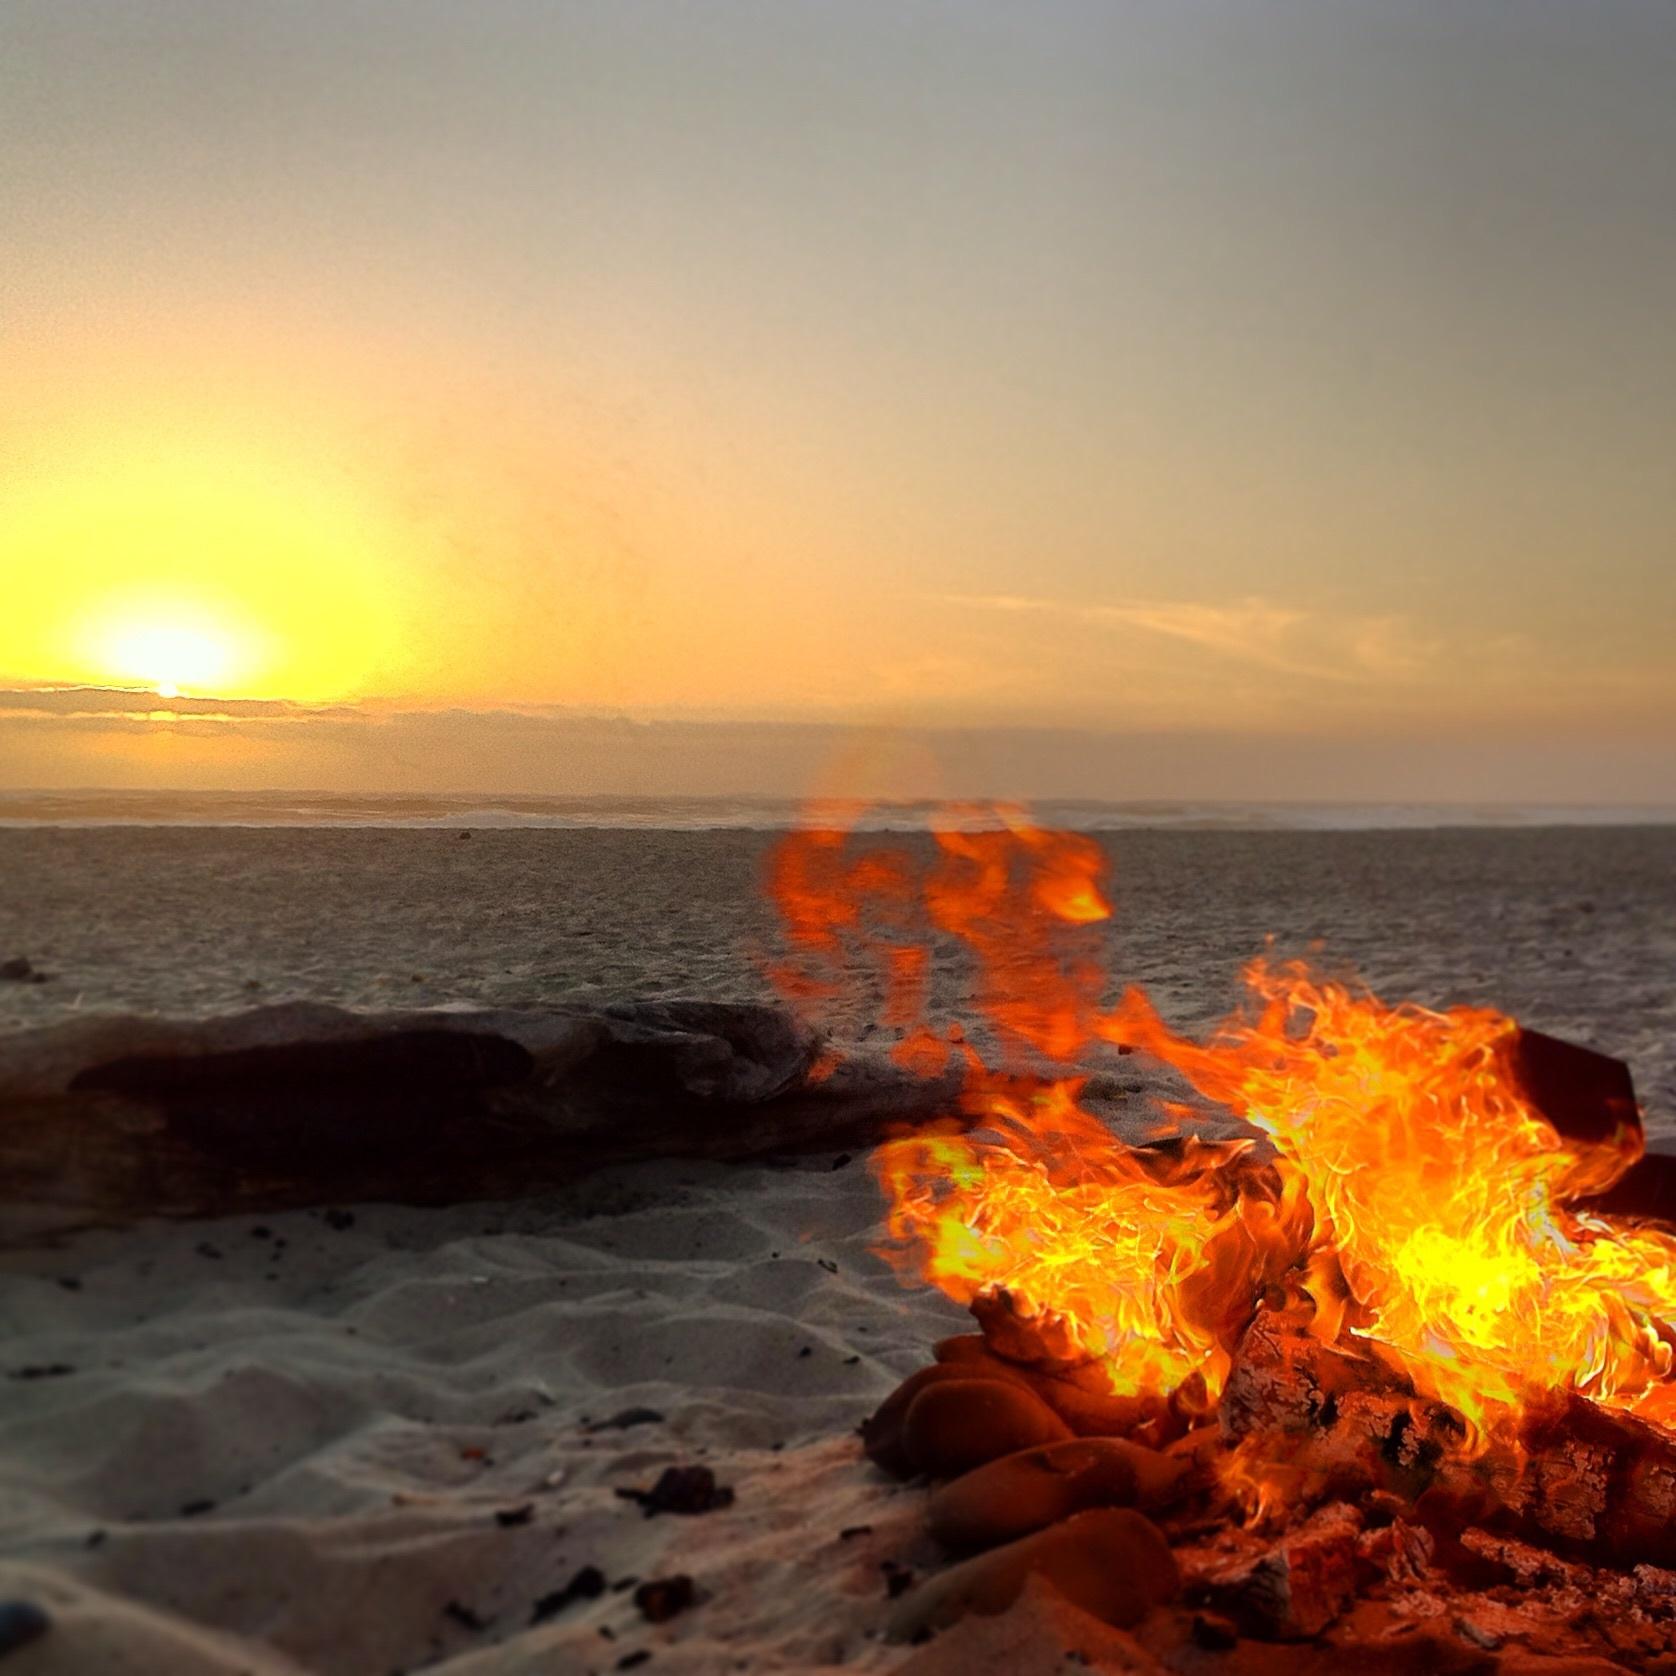 картинки с огонь вода солнце